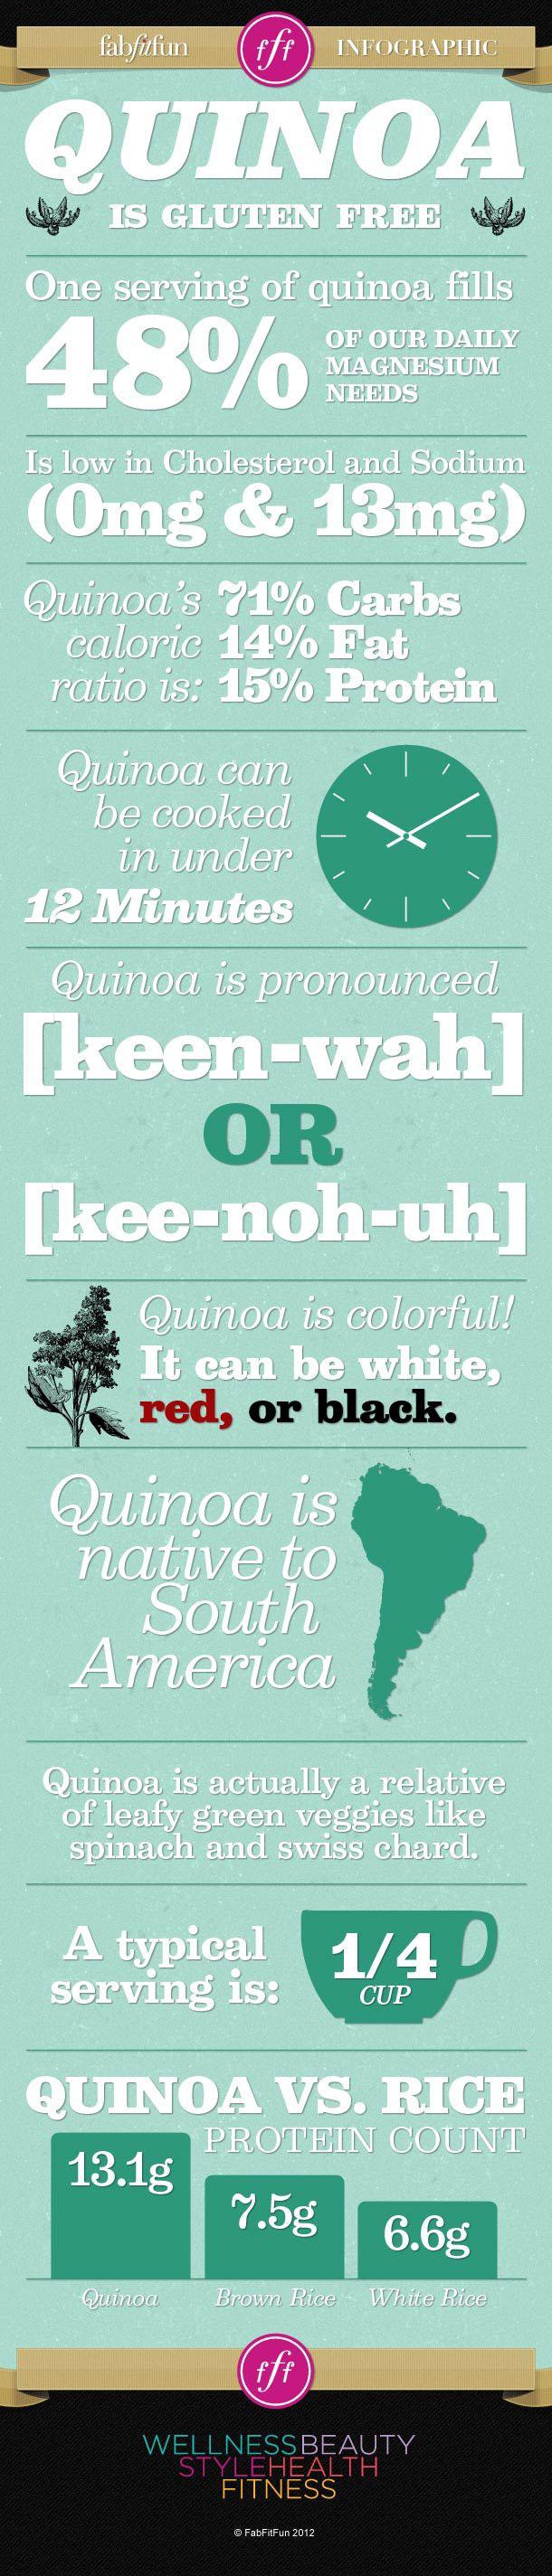 quinoa-infographic